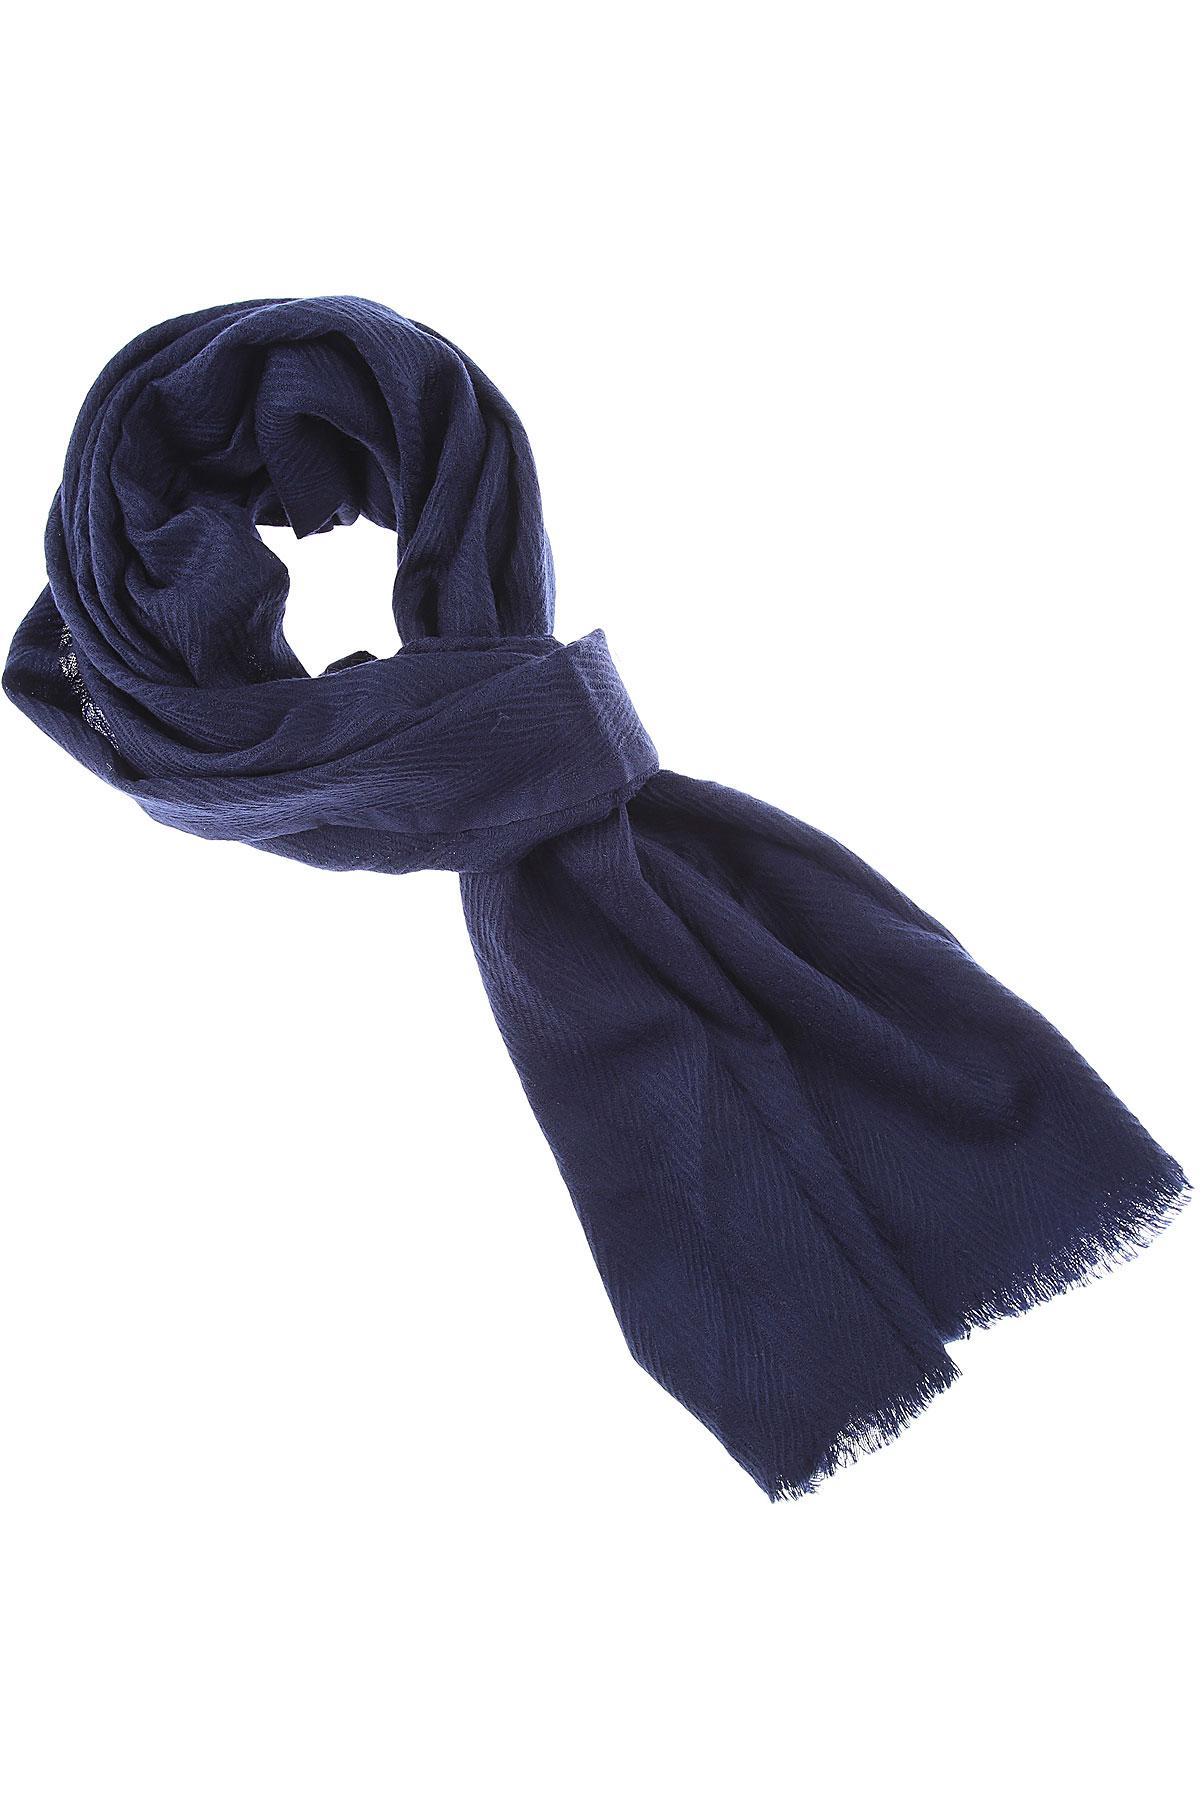 032c Scarf for Women On Sale, Night Blue, Wool, 2019